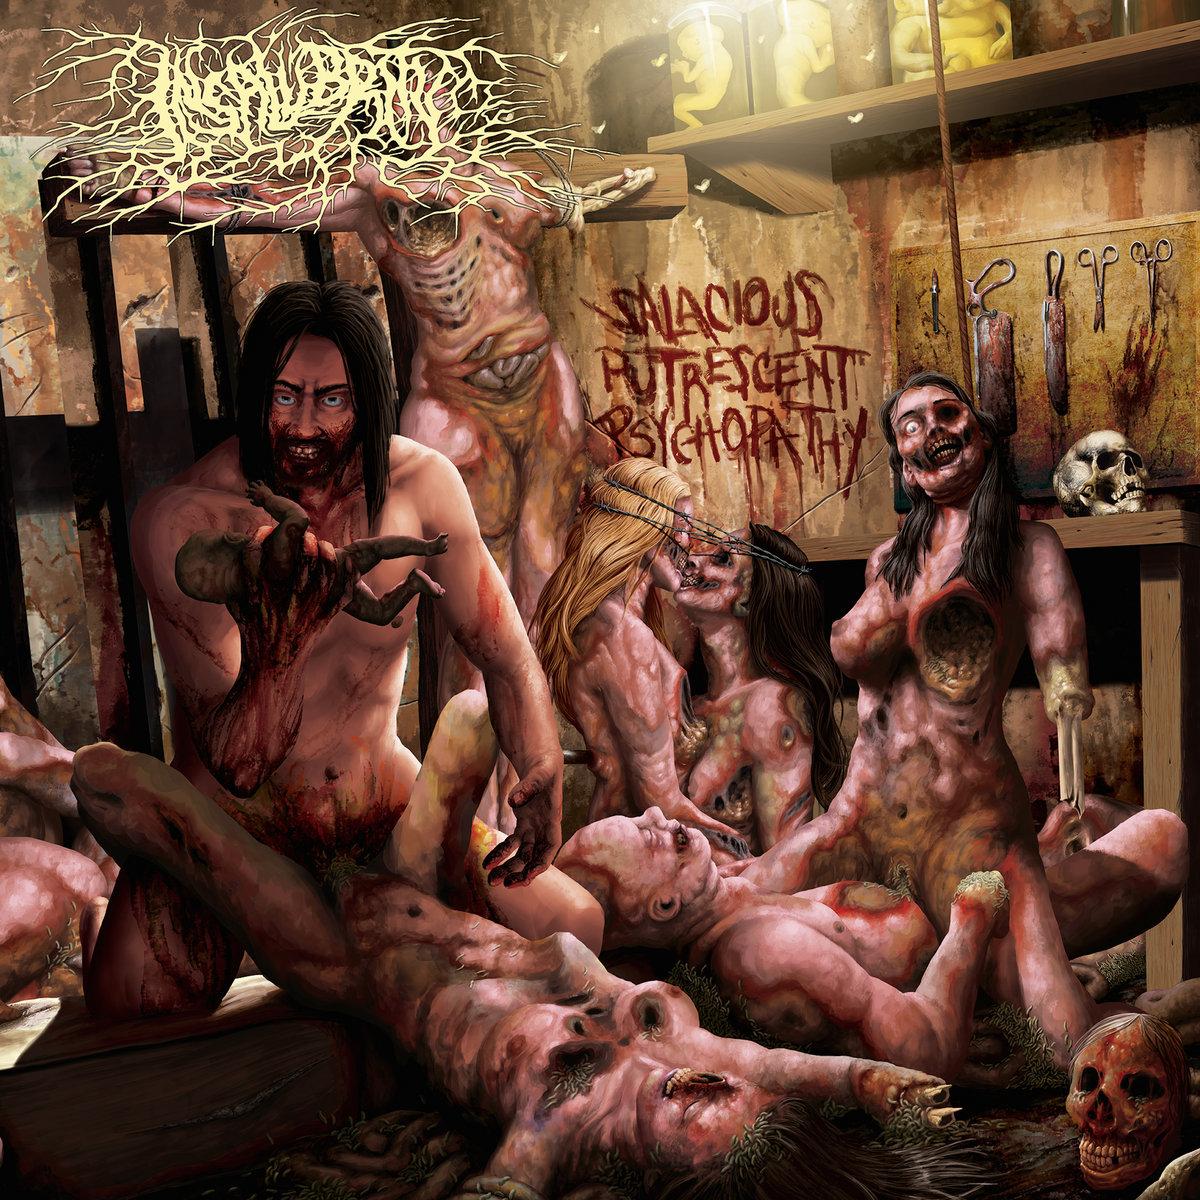 Insalubrity - Salacious Putrescent Psychopathy (2020) [FLAC] Download